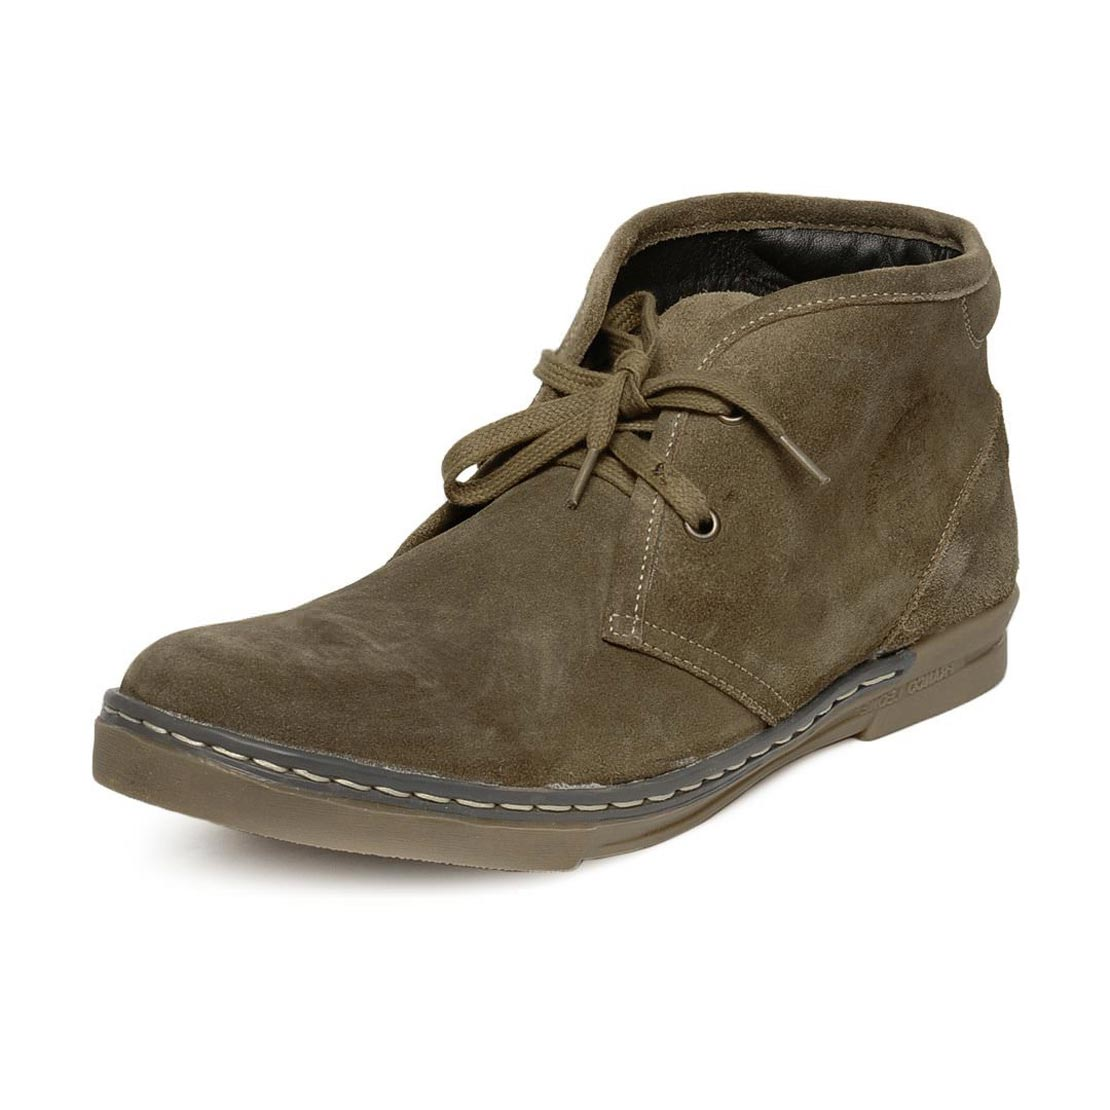 Franco Leone 9514 Camel Men's Casual Shoes